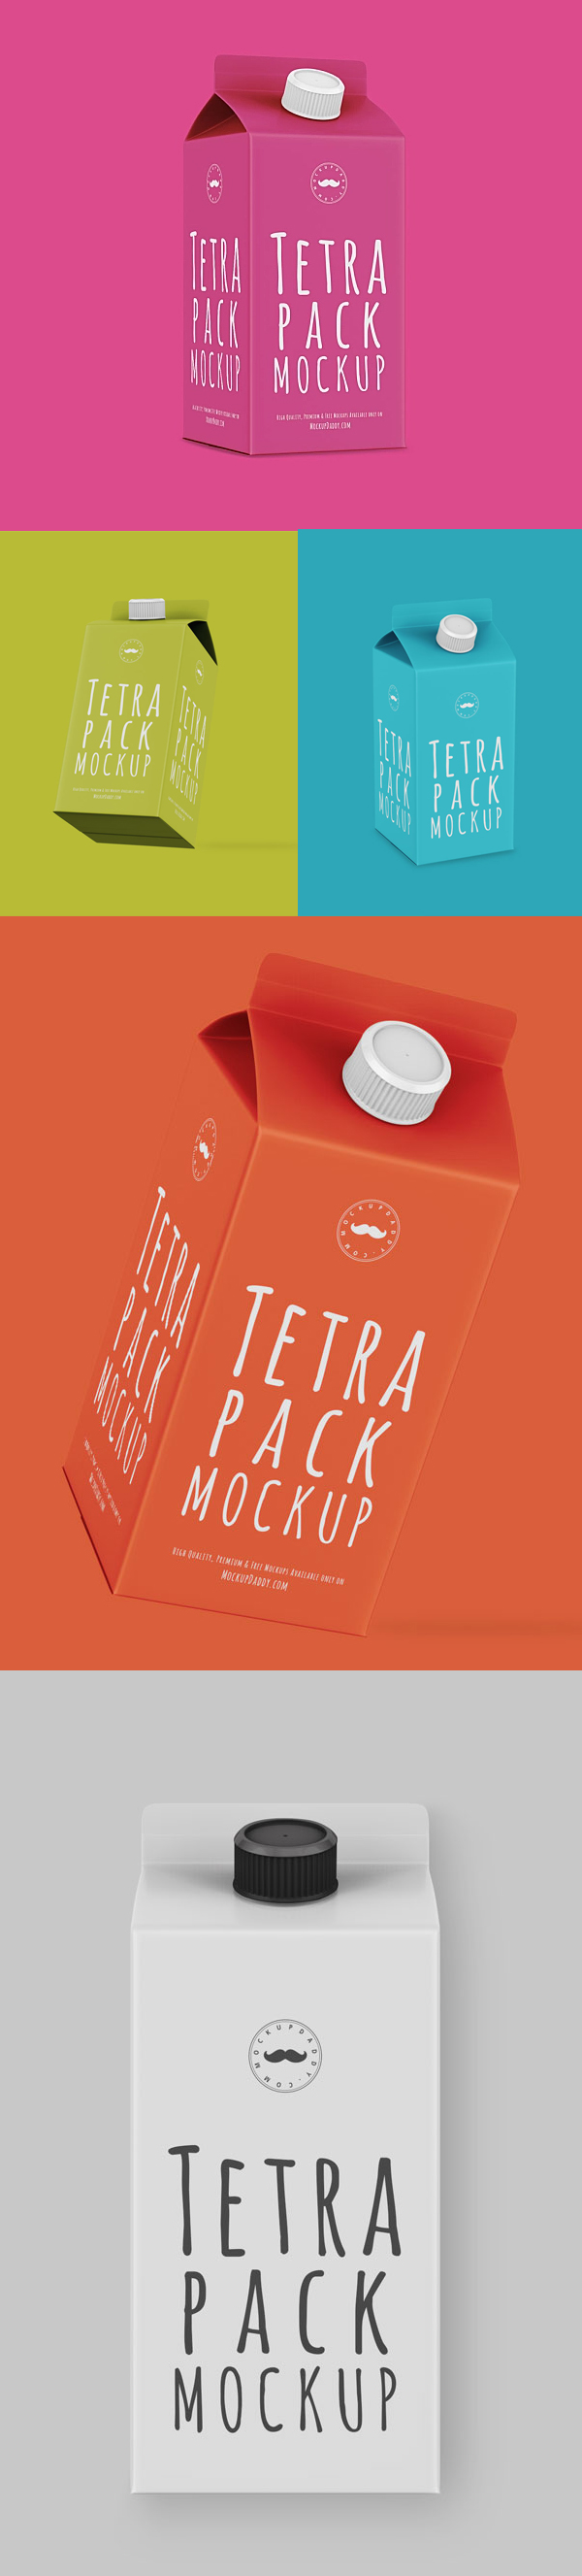 Free Tetra Pack Mockup PSD